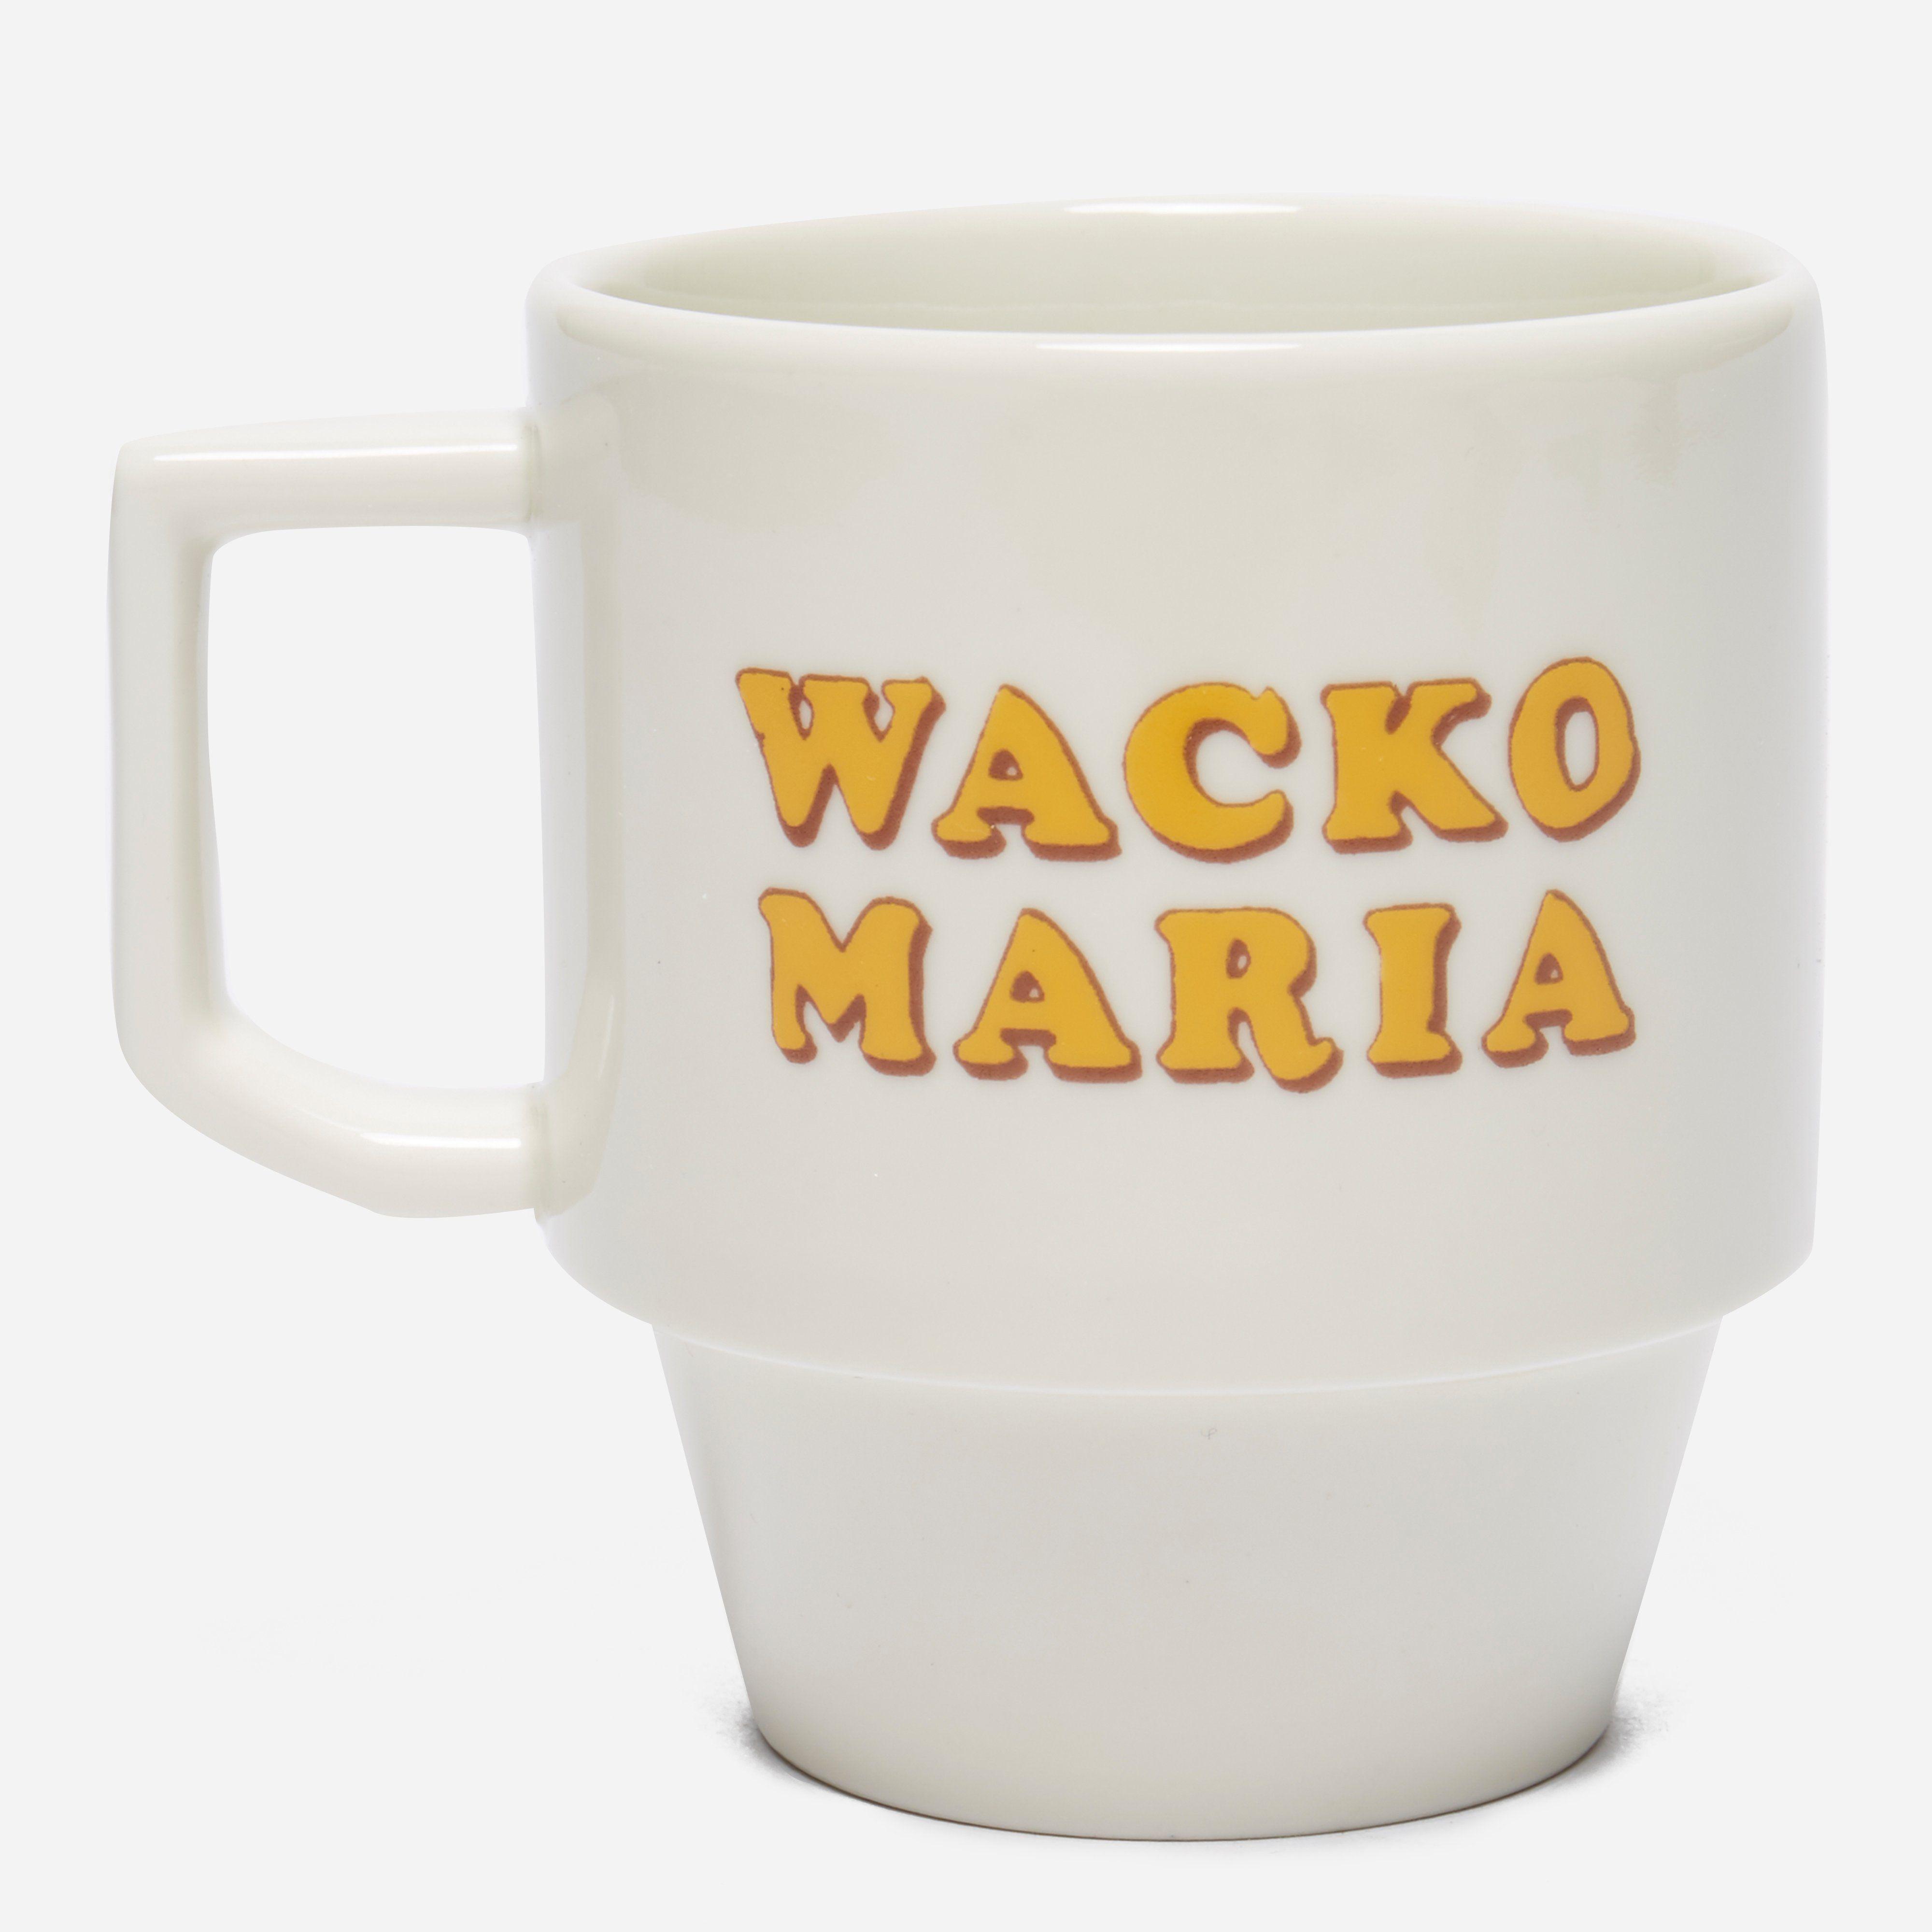 Wacko Maria Mug